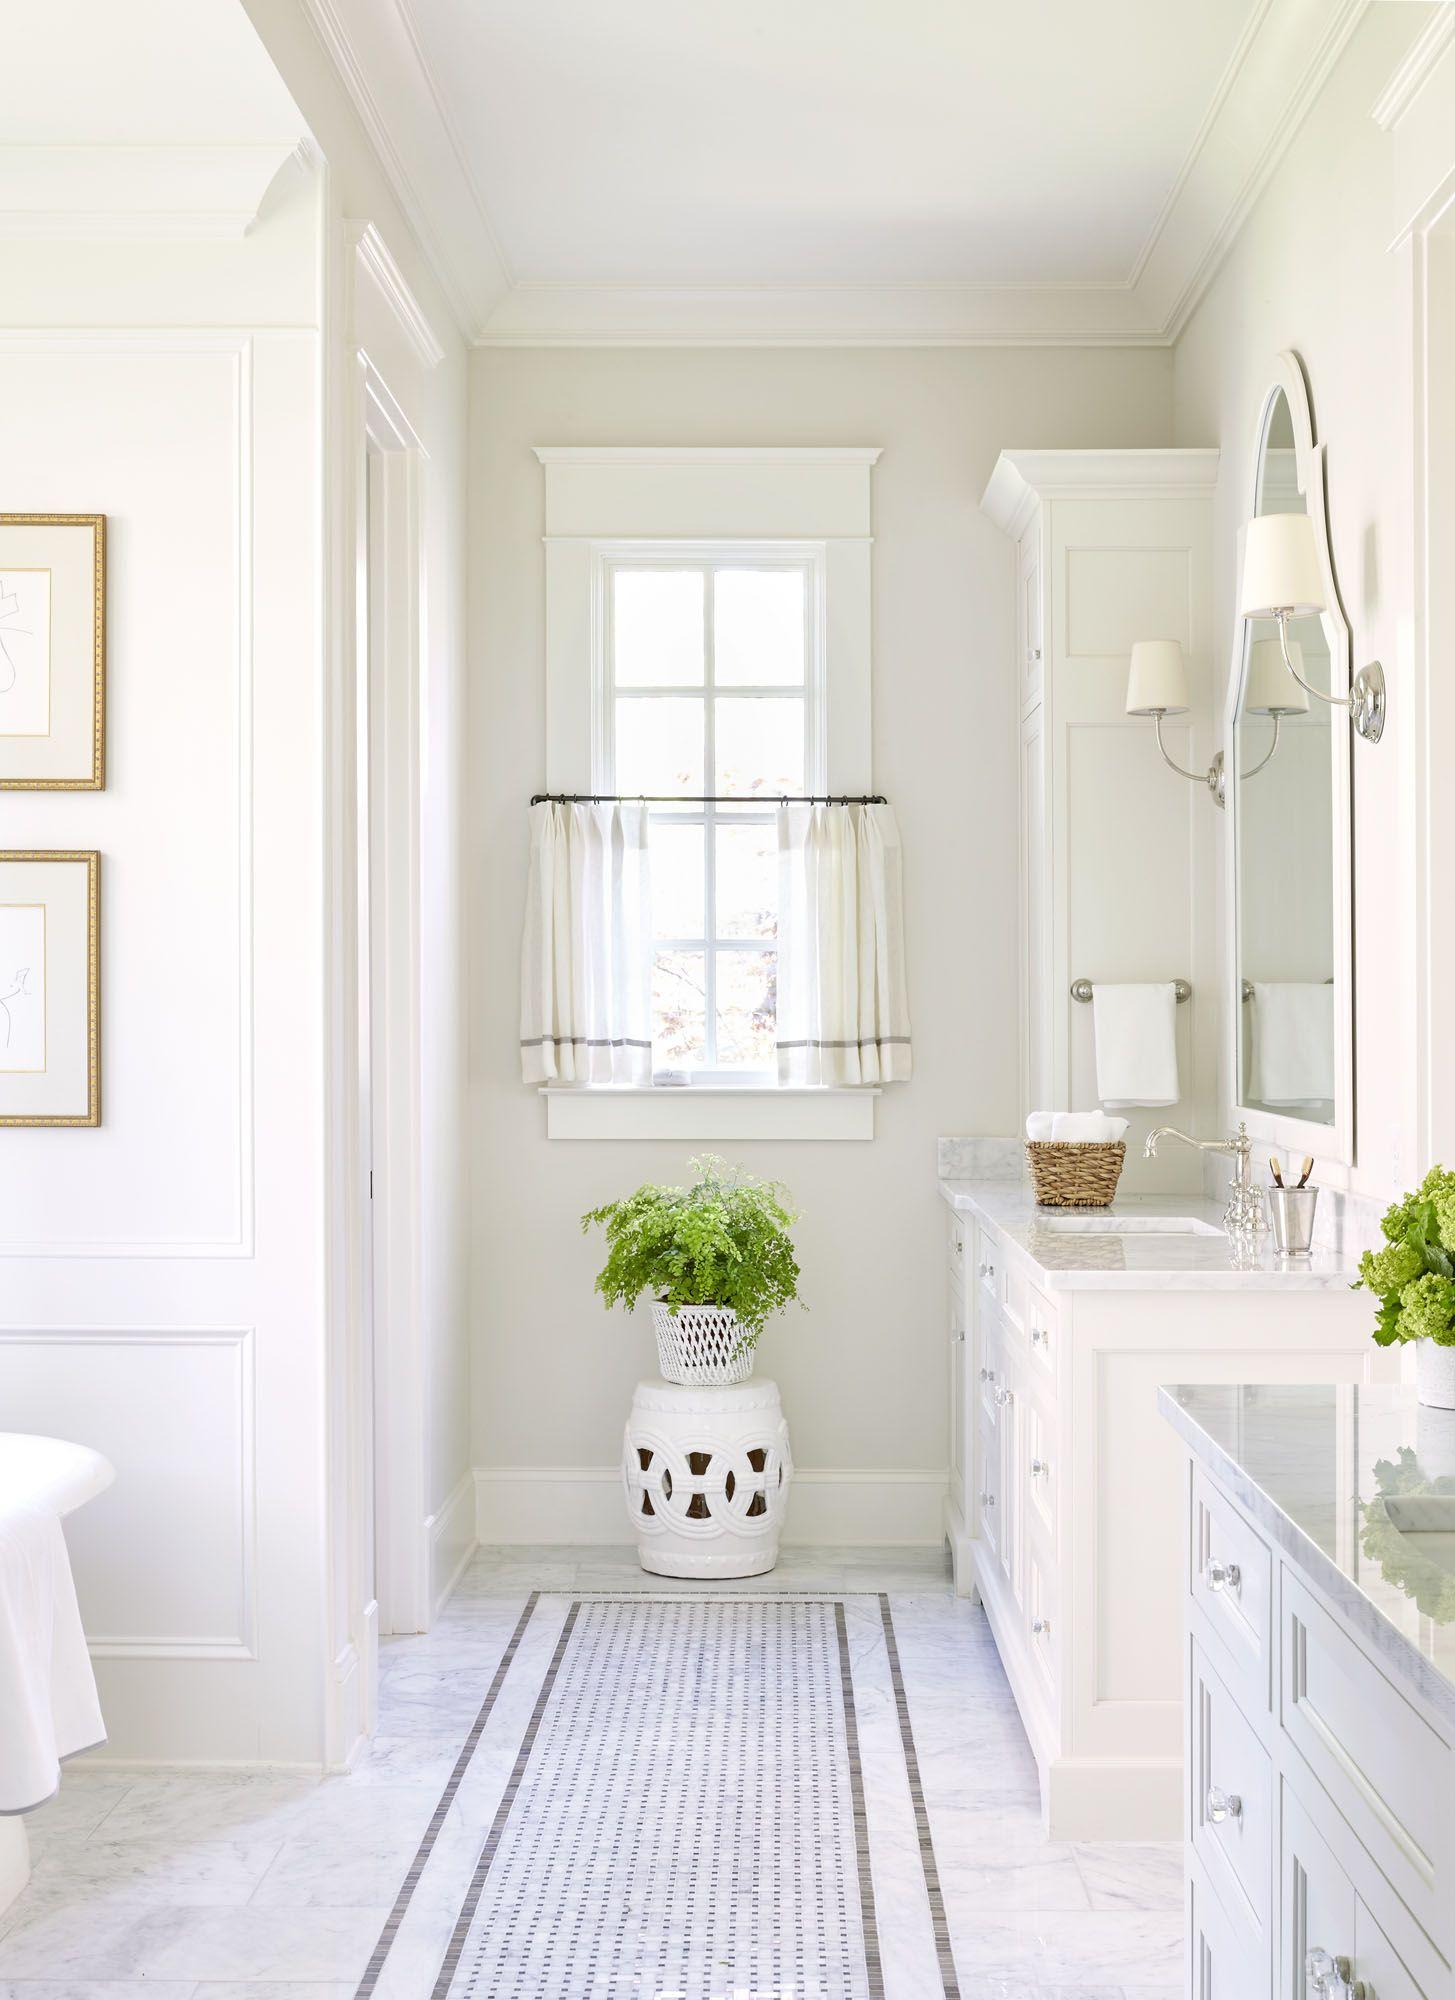 Sarah Bartholomew white classic bathroom with traditional design.